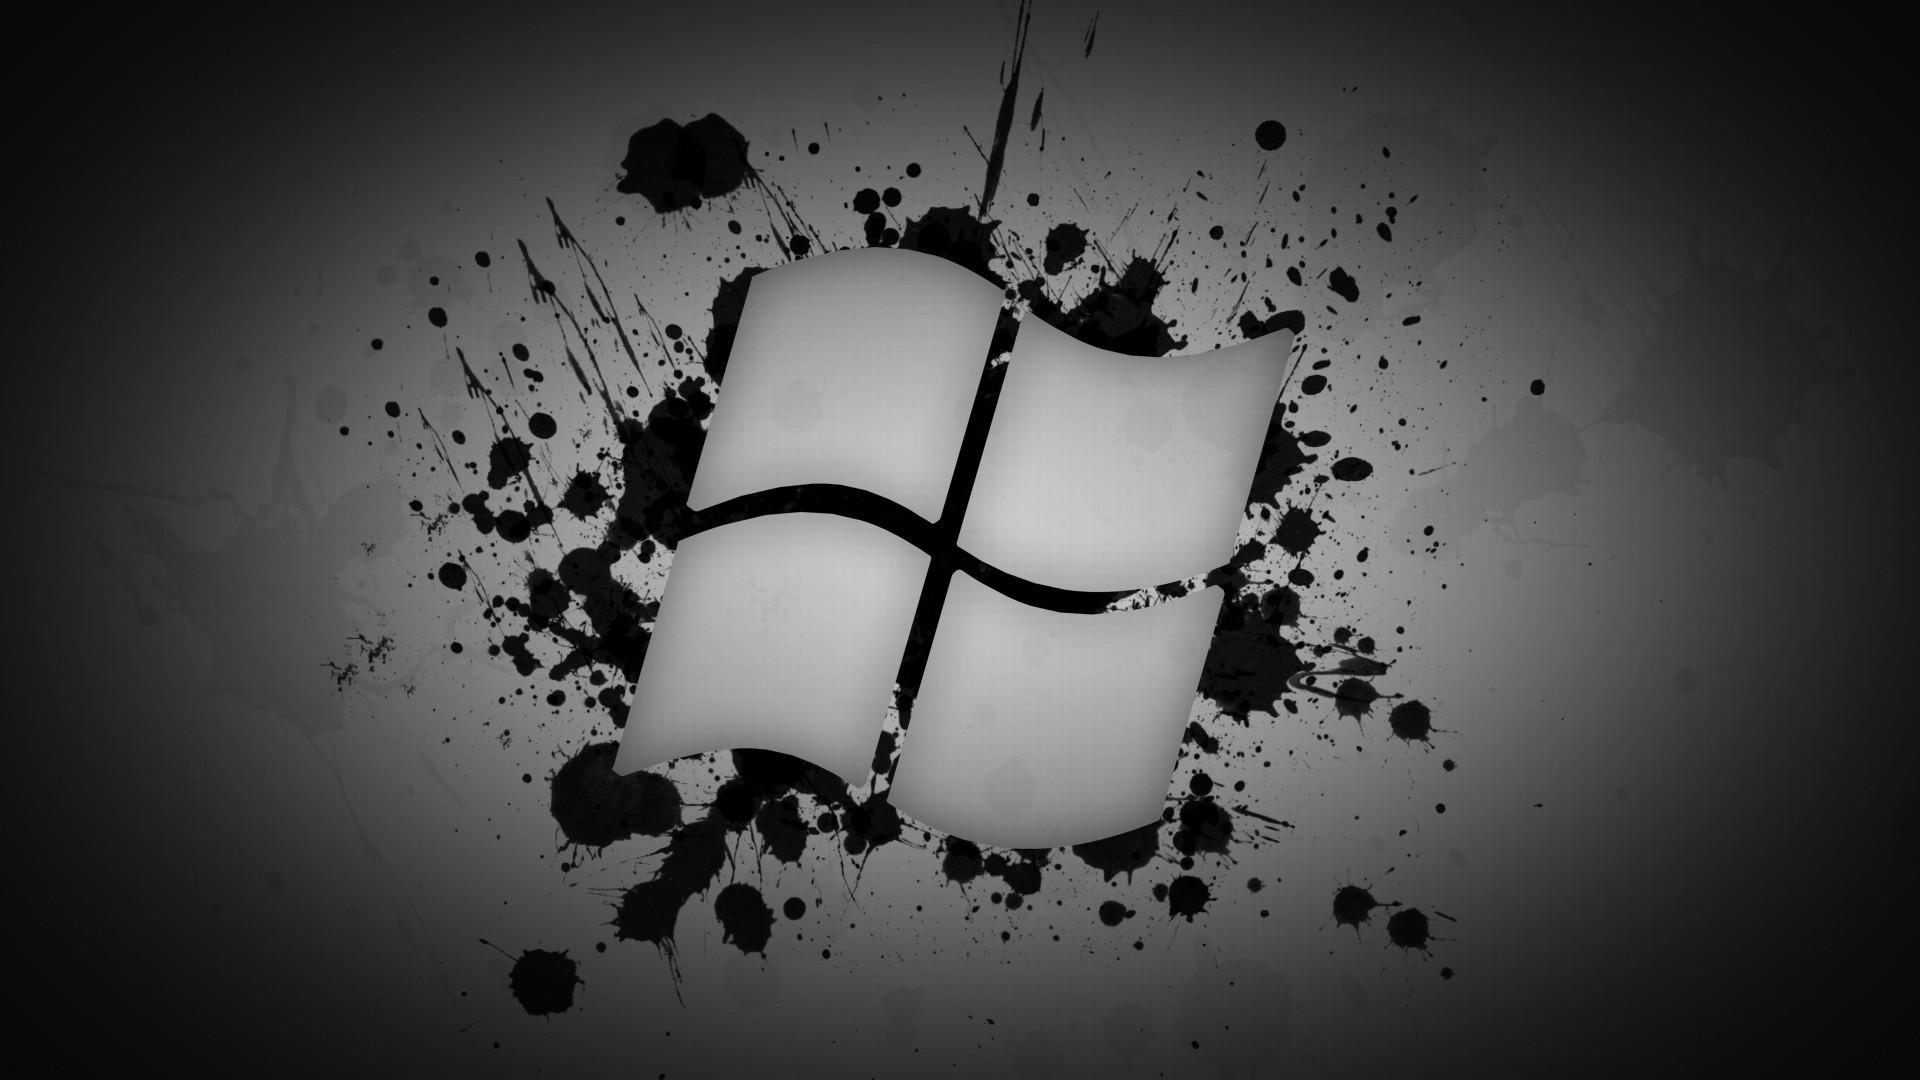 White Black Illustration Monochrome Photography Circle Paint Splatter Microsoft Windows Emotion Light Hand Shape Darkness Computer